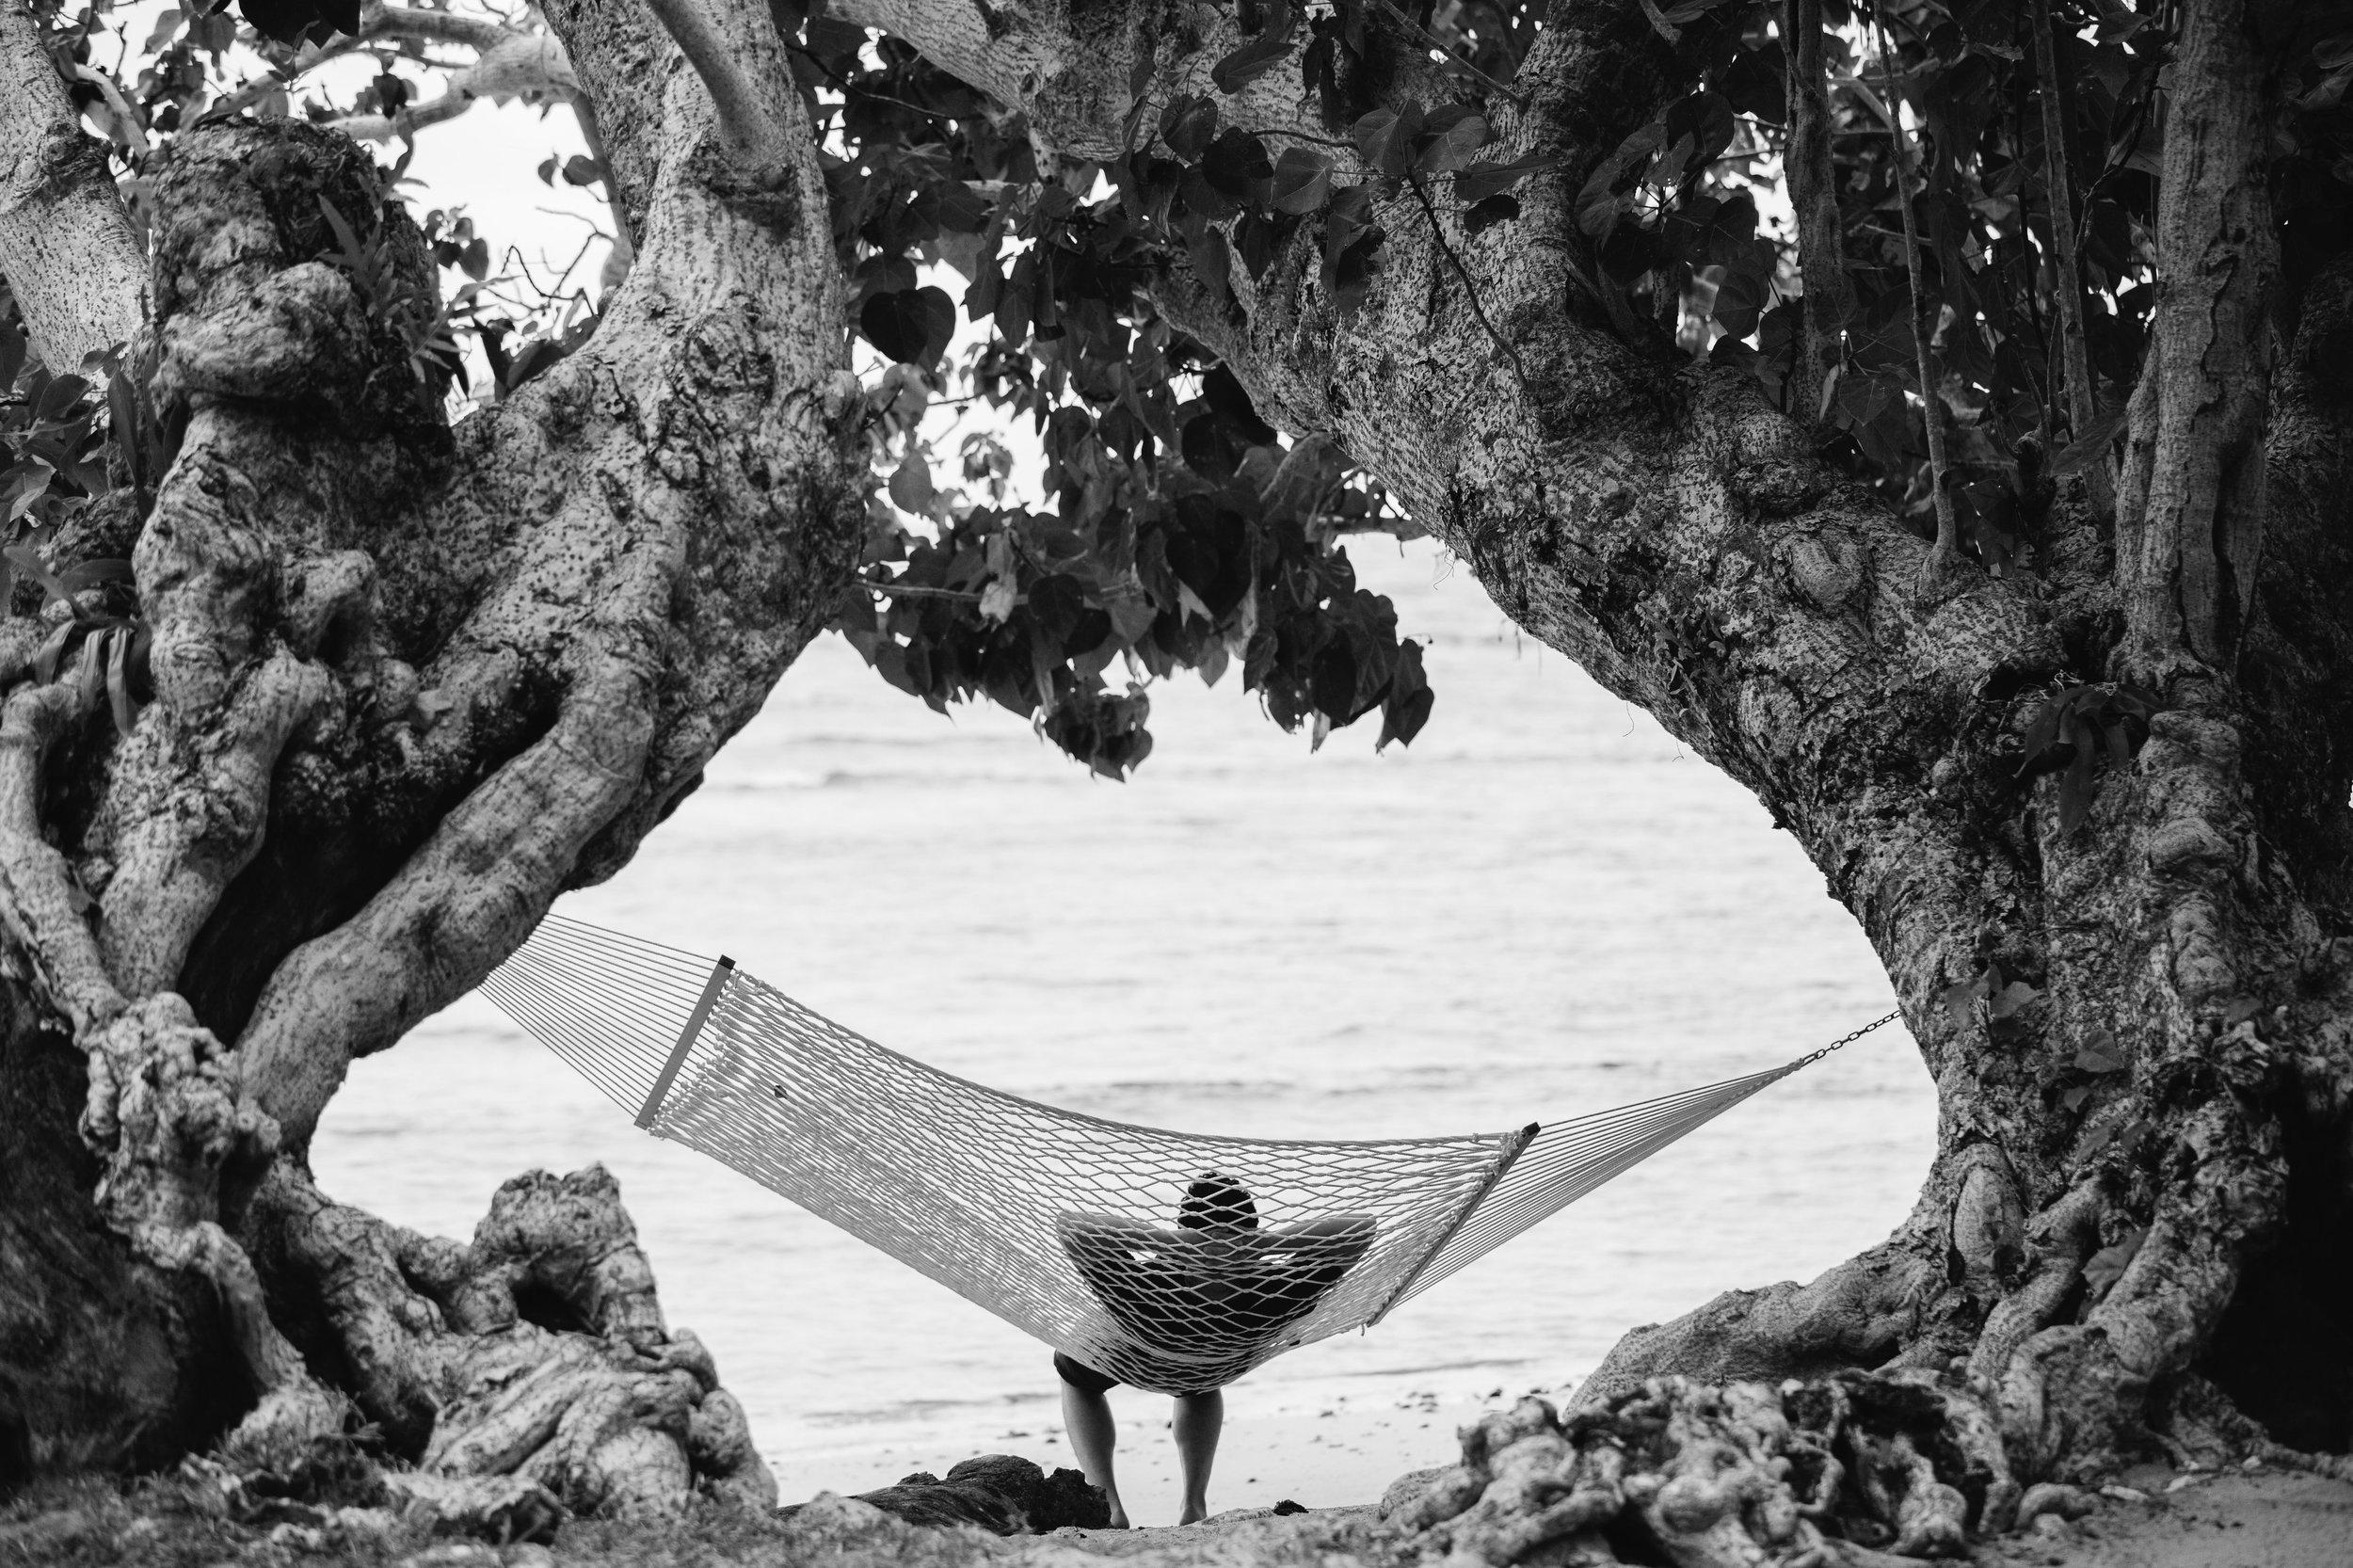 Hammock -The Remote Resort, Fiji Islands